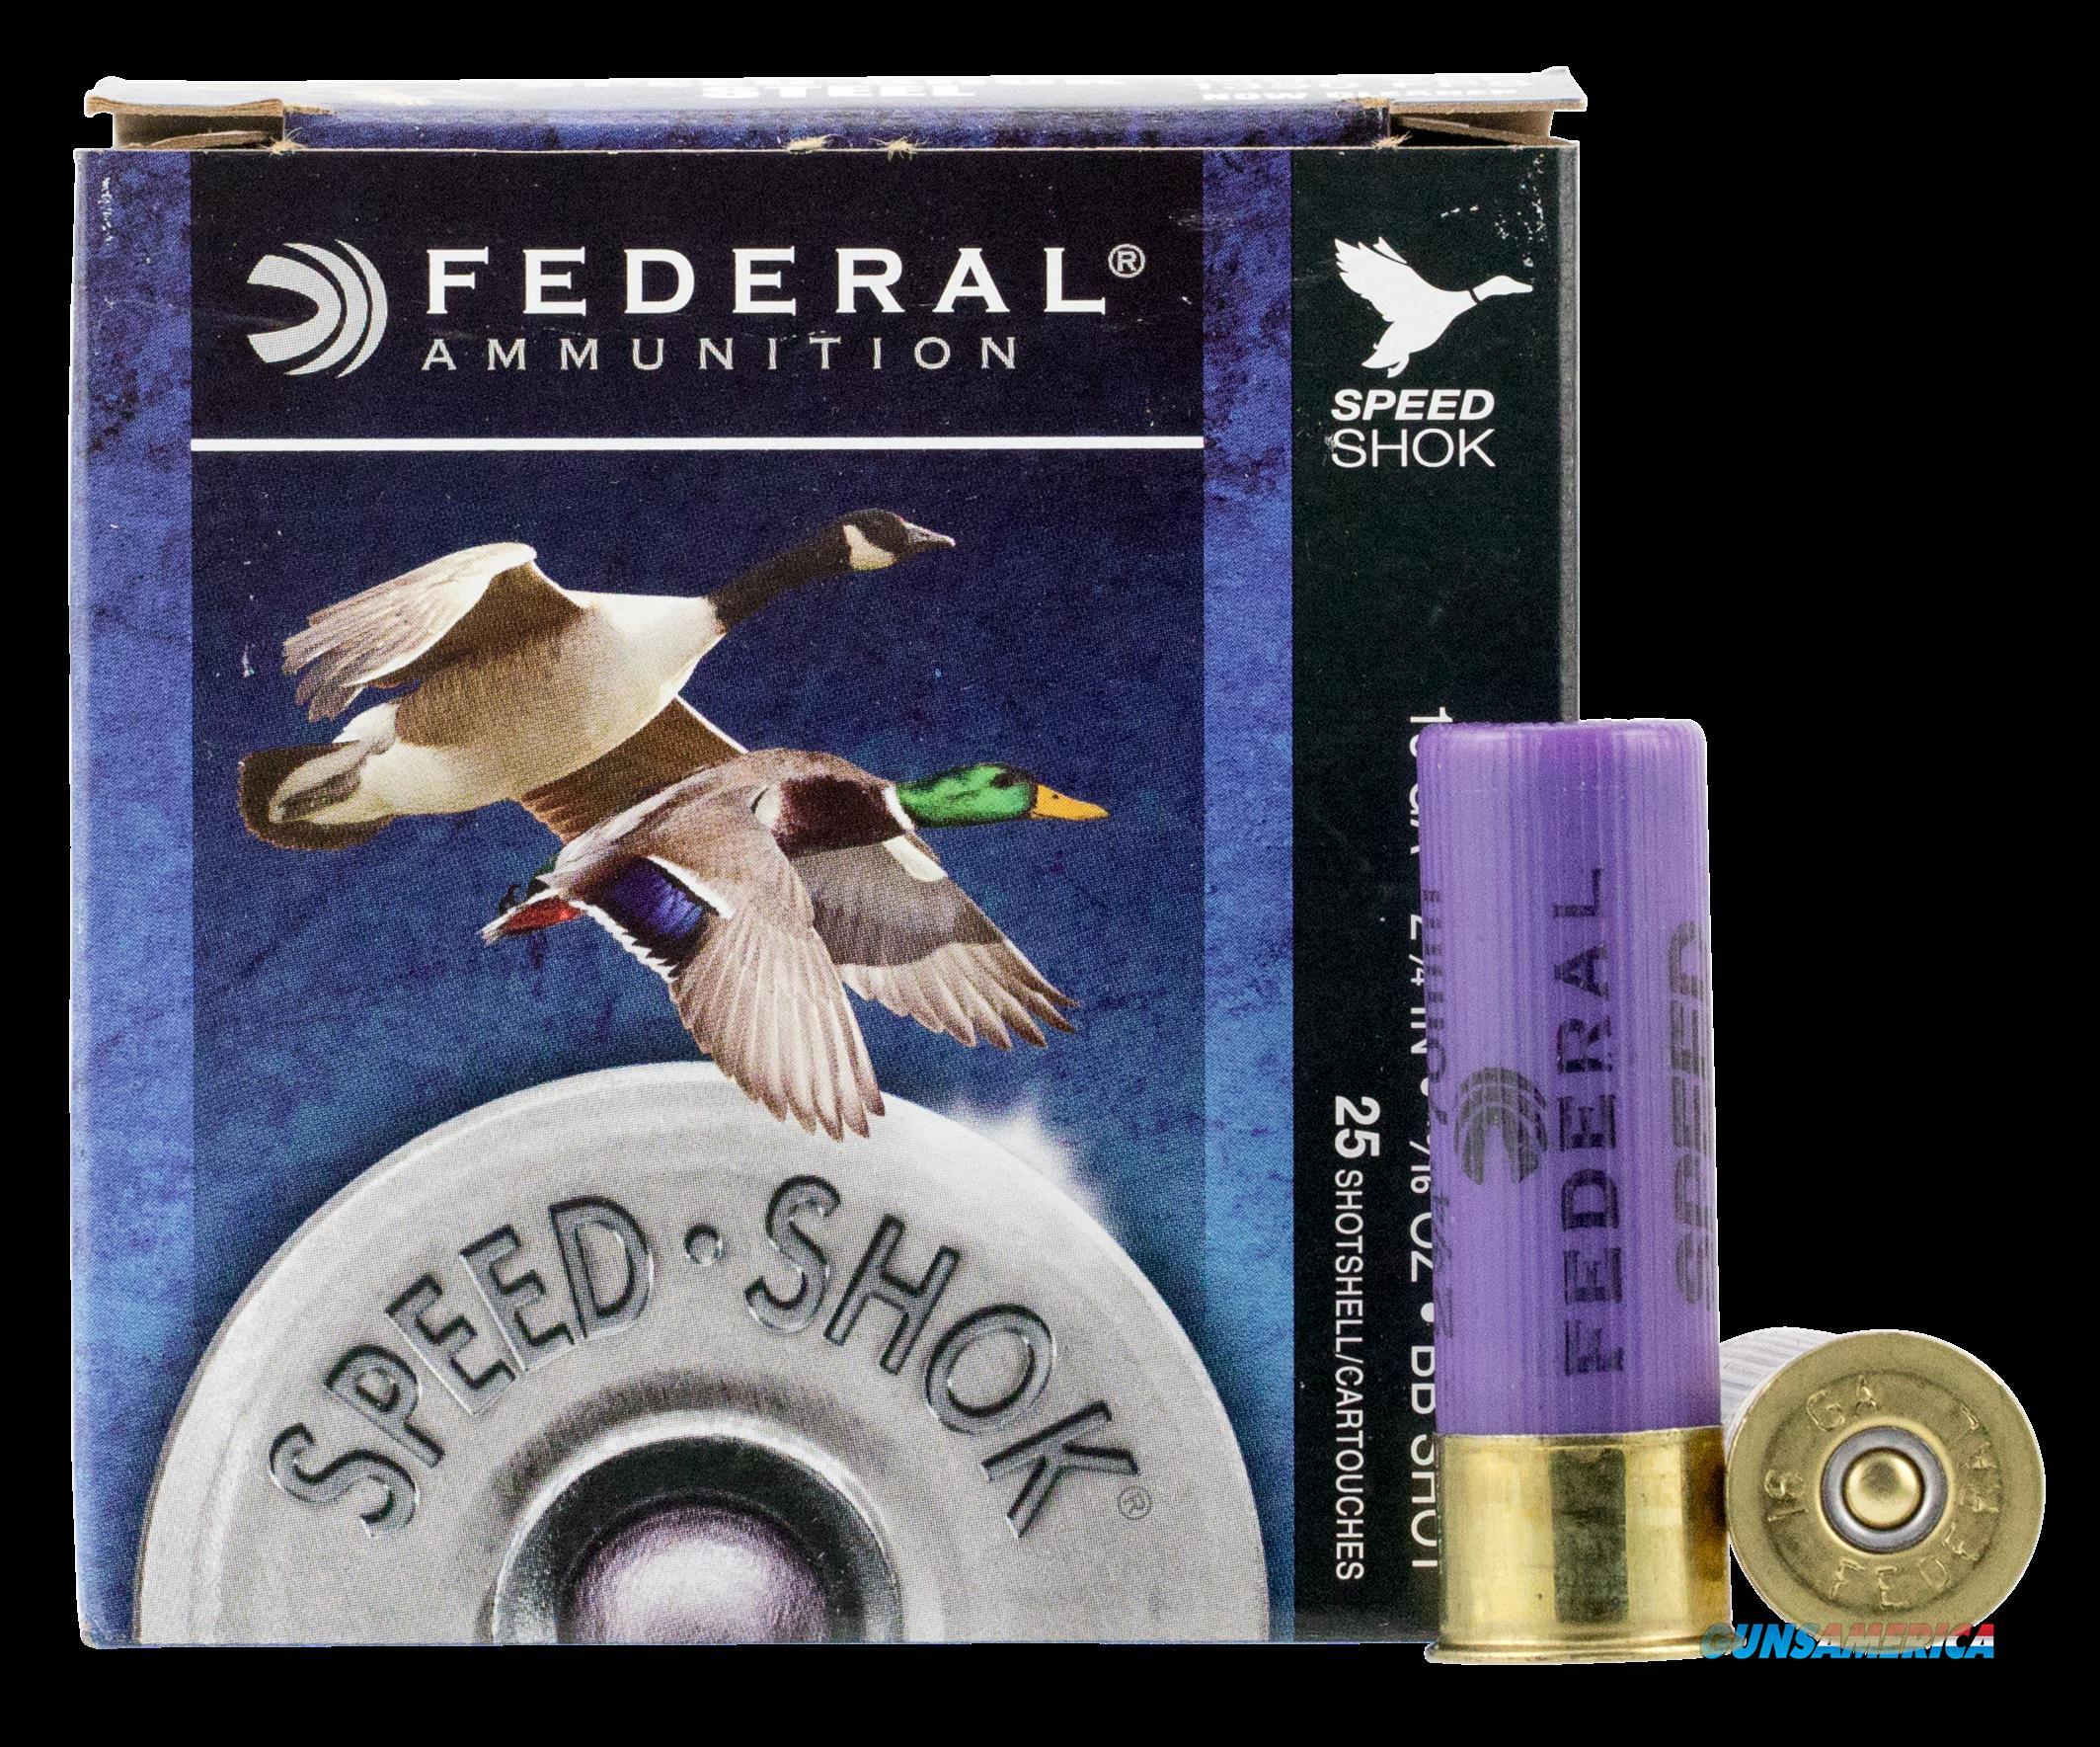 Federal Speed-shok, Fed Wf168bb       Spdshk 16    15-16     25-10 Stl  Guns > Pistols > 1911 Pistol Copies (non-Colt)